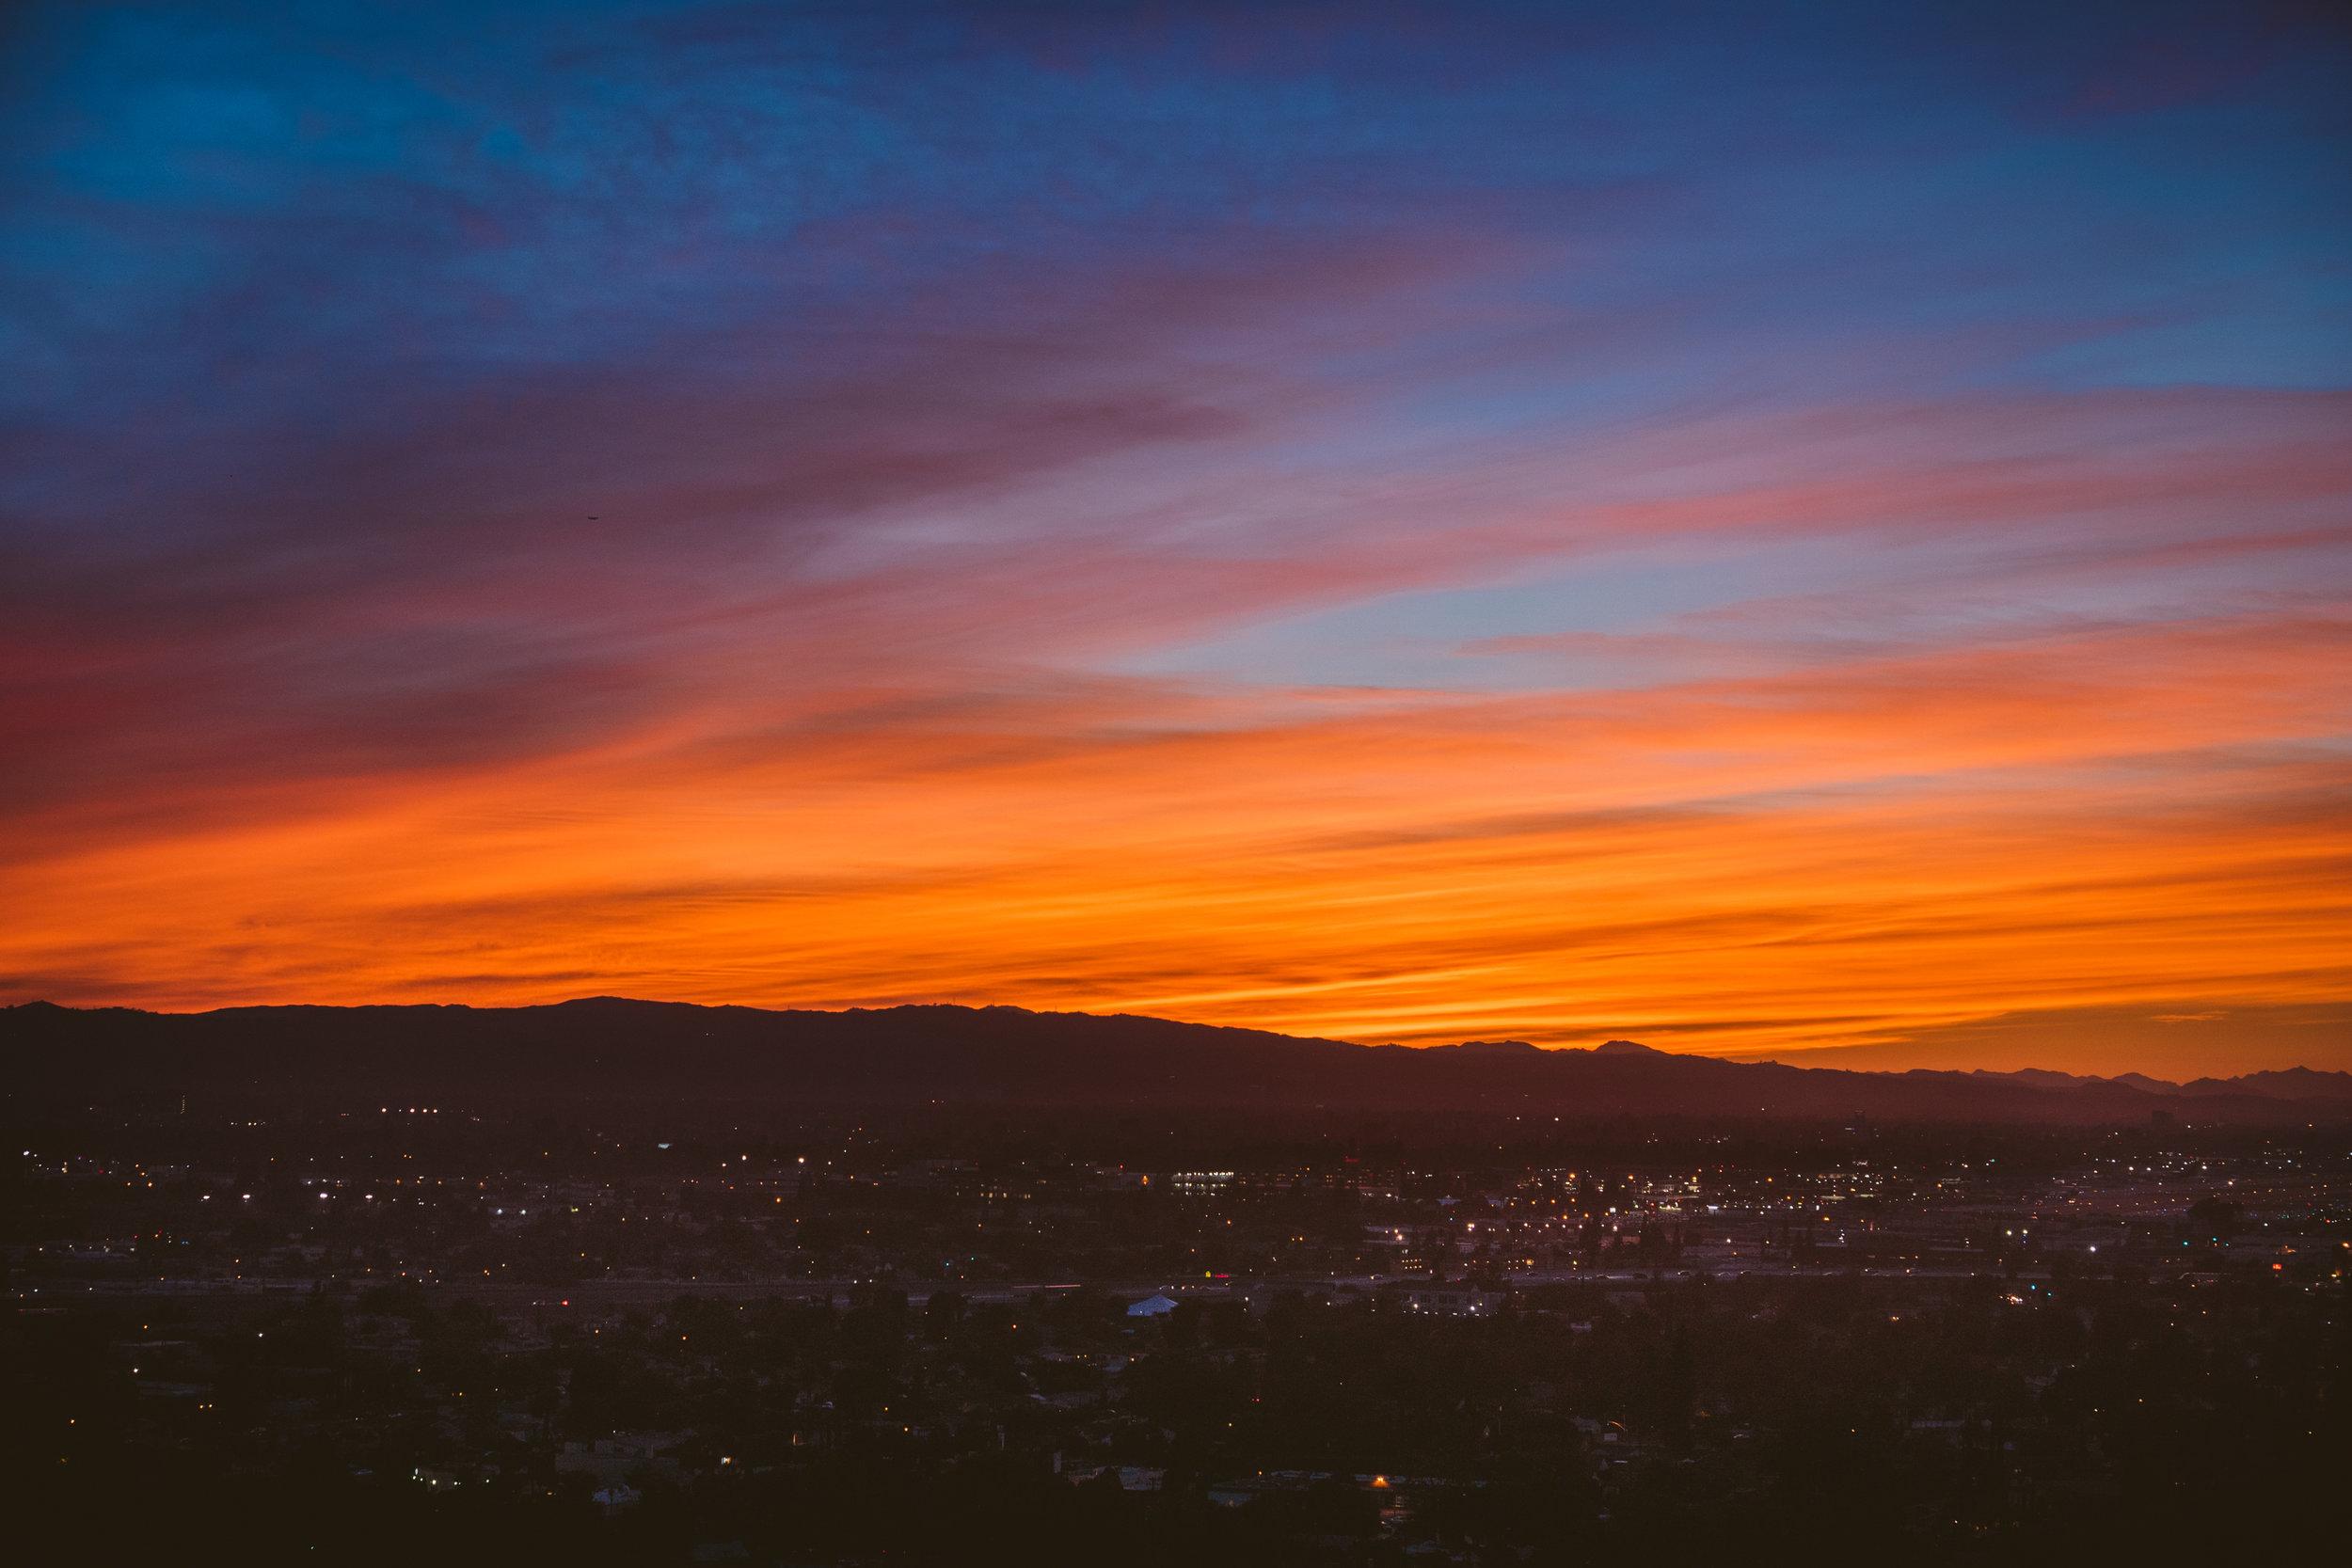 SunsetBurbankWeb-02944.jpg